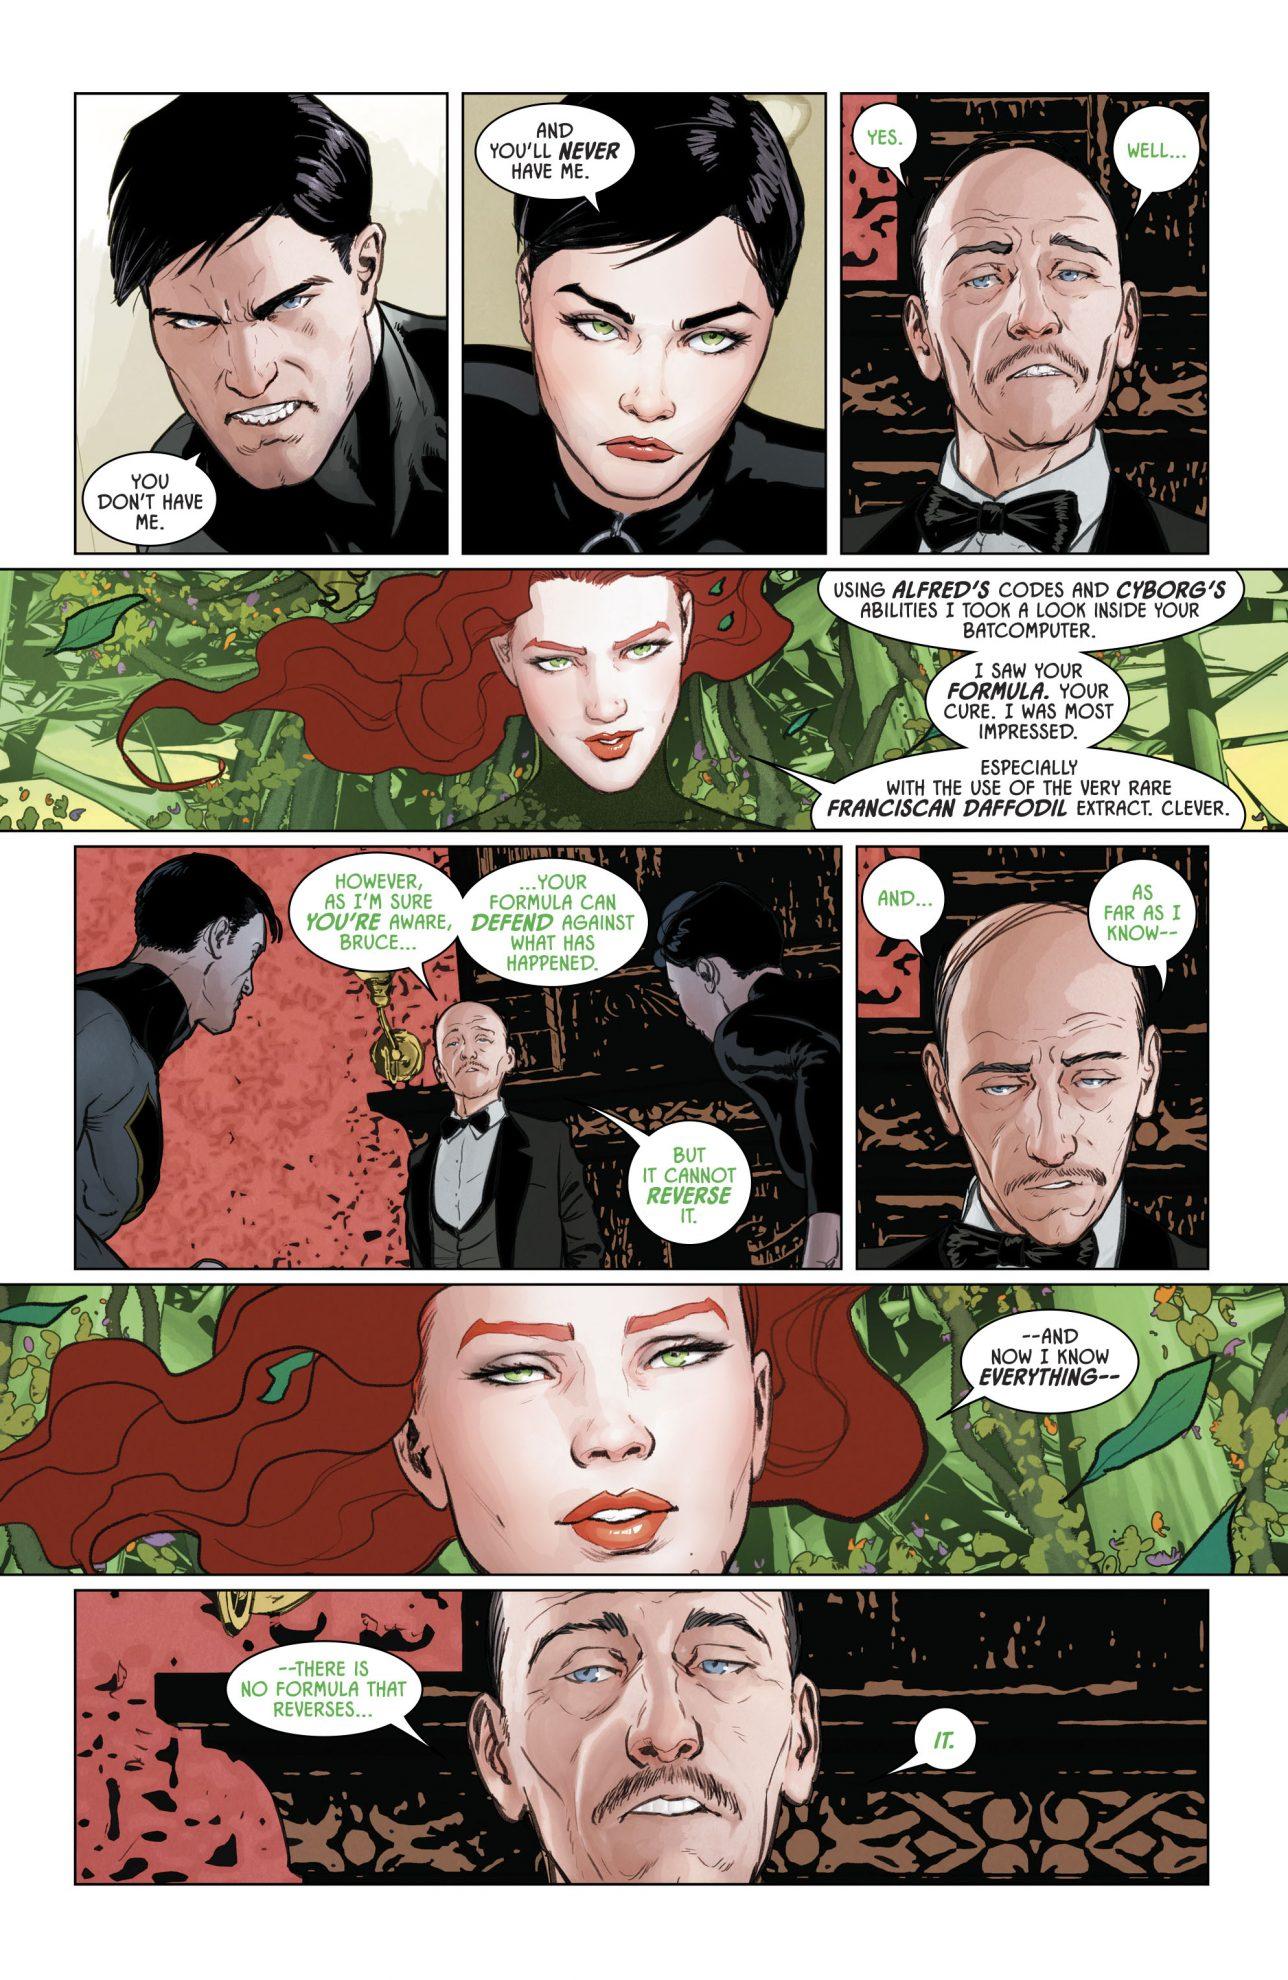 Poison Ivy Mind Controls 7 Billion People